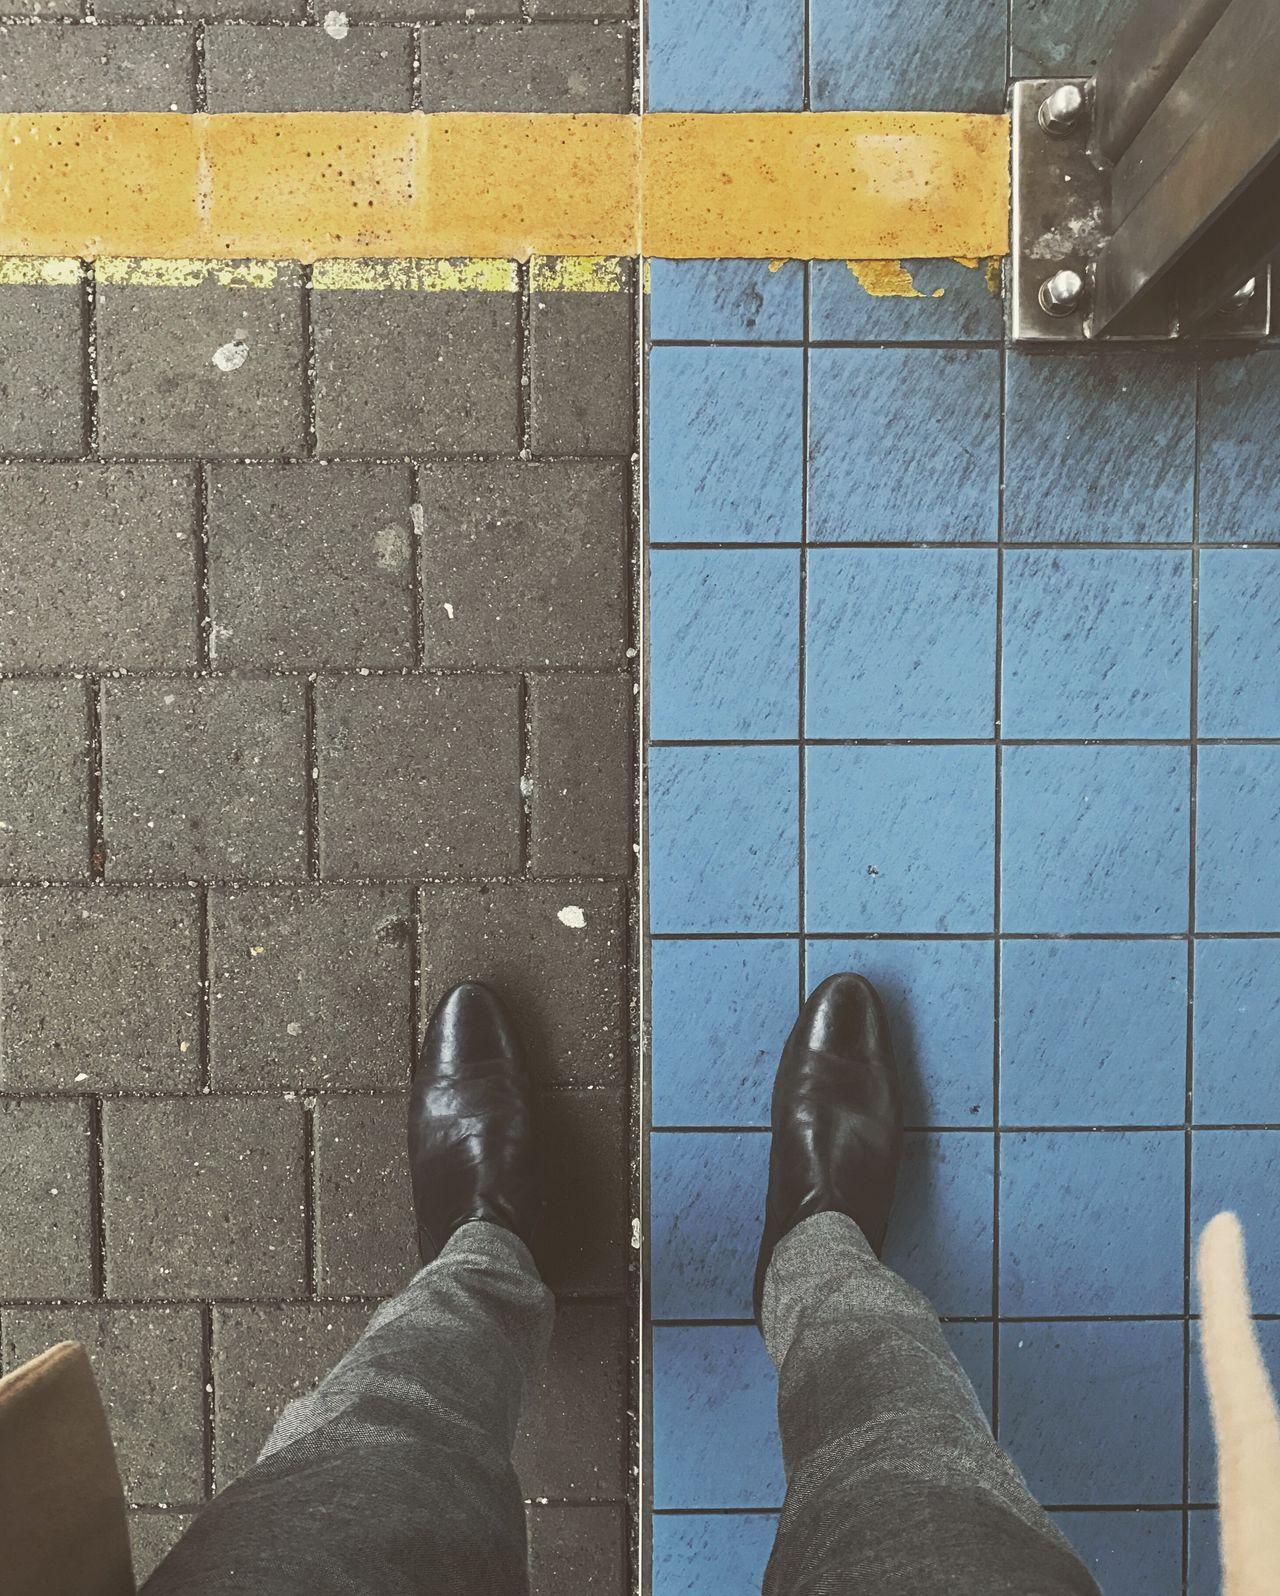 Waiting Symmetry Geometric Shapes Square Tiles Grid Pattern Colors Contrast Train Station Platform Urban Urban Geometry Wolfsburg Lines